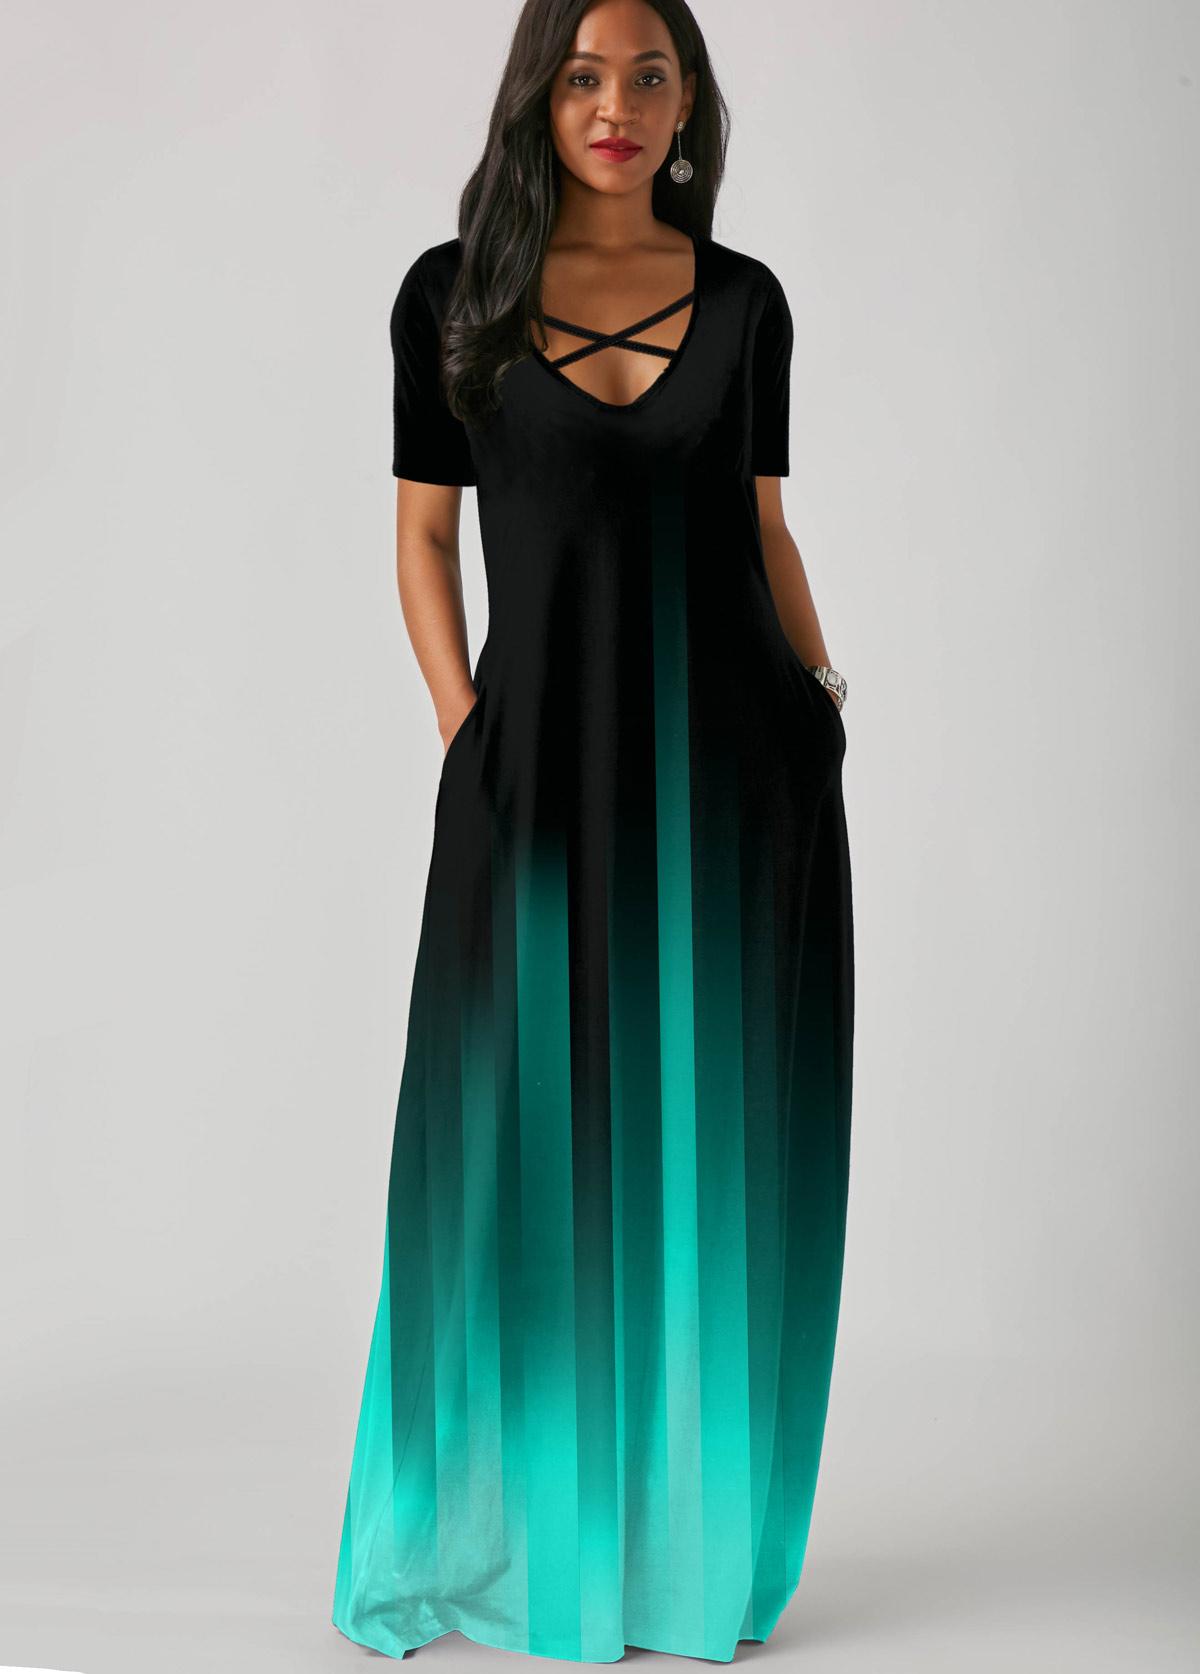 Mint Green Gradient Side Pocket Short Sleeve Maxi Dress